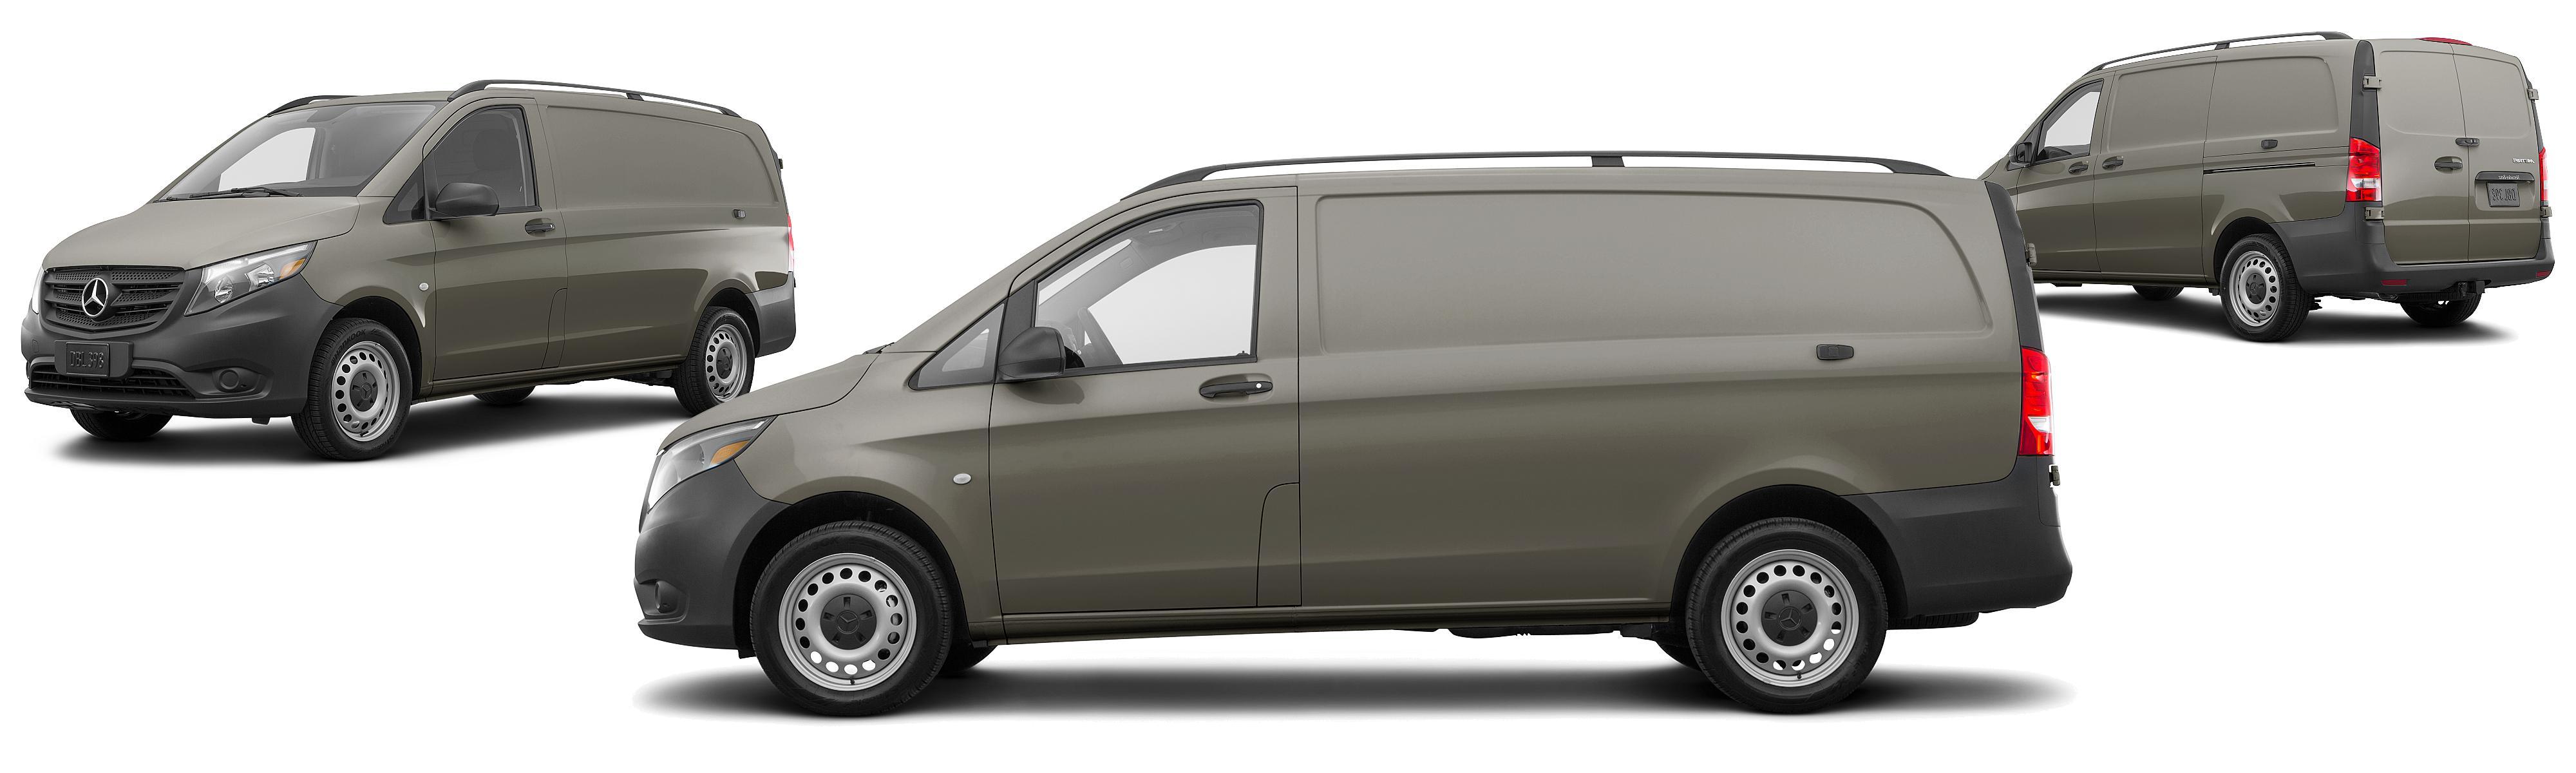 2016 Mercedes Benz Metris Cargo 3dr Mini Van Research GrooveCar